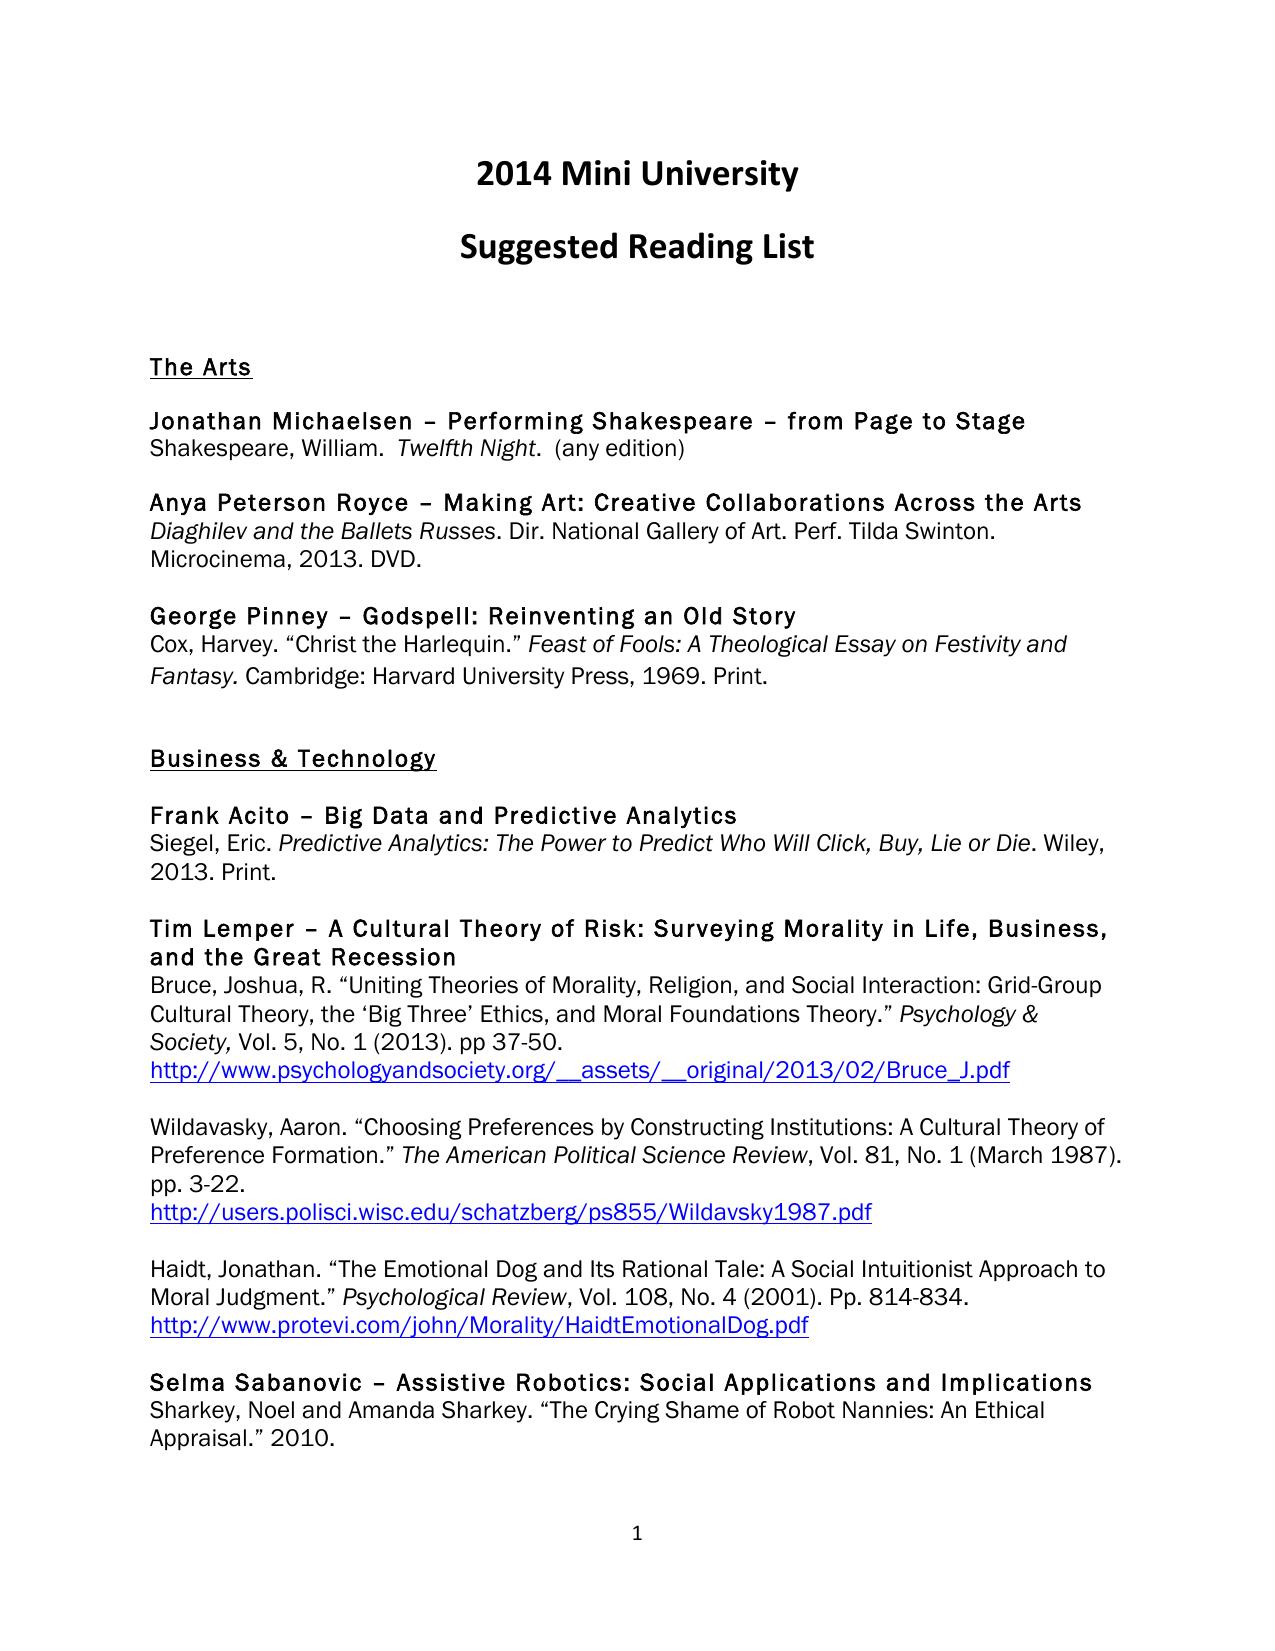 2014 Mini University Suggested Reading List